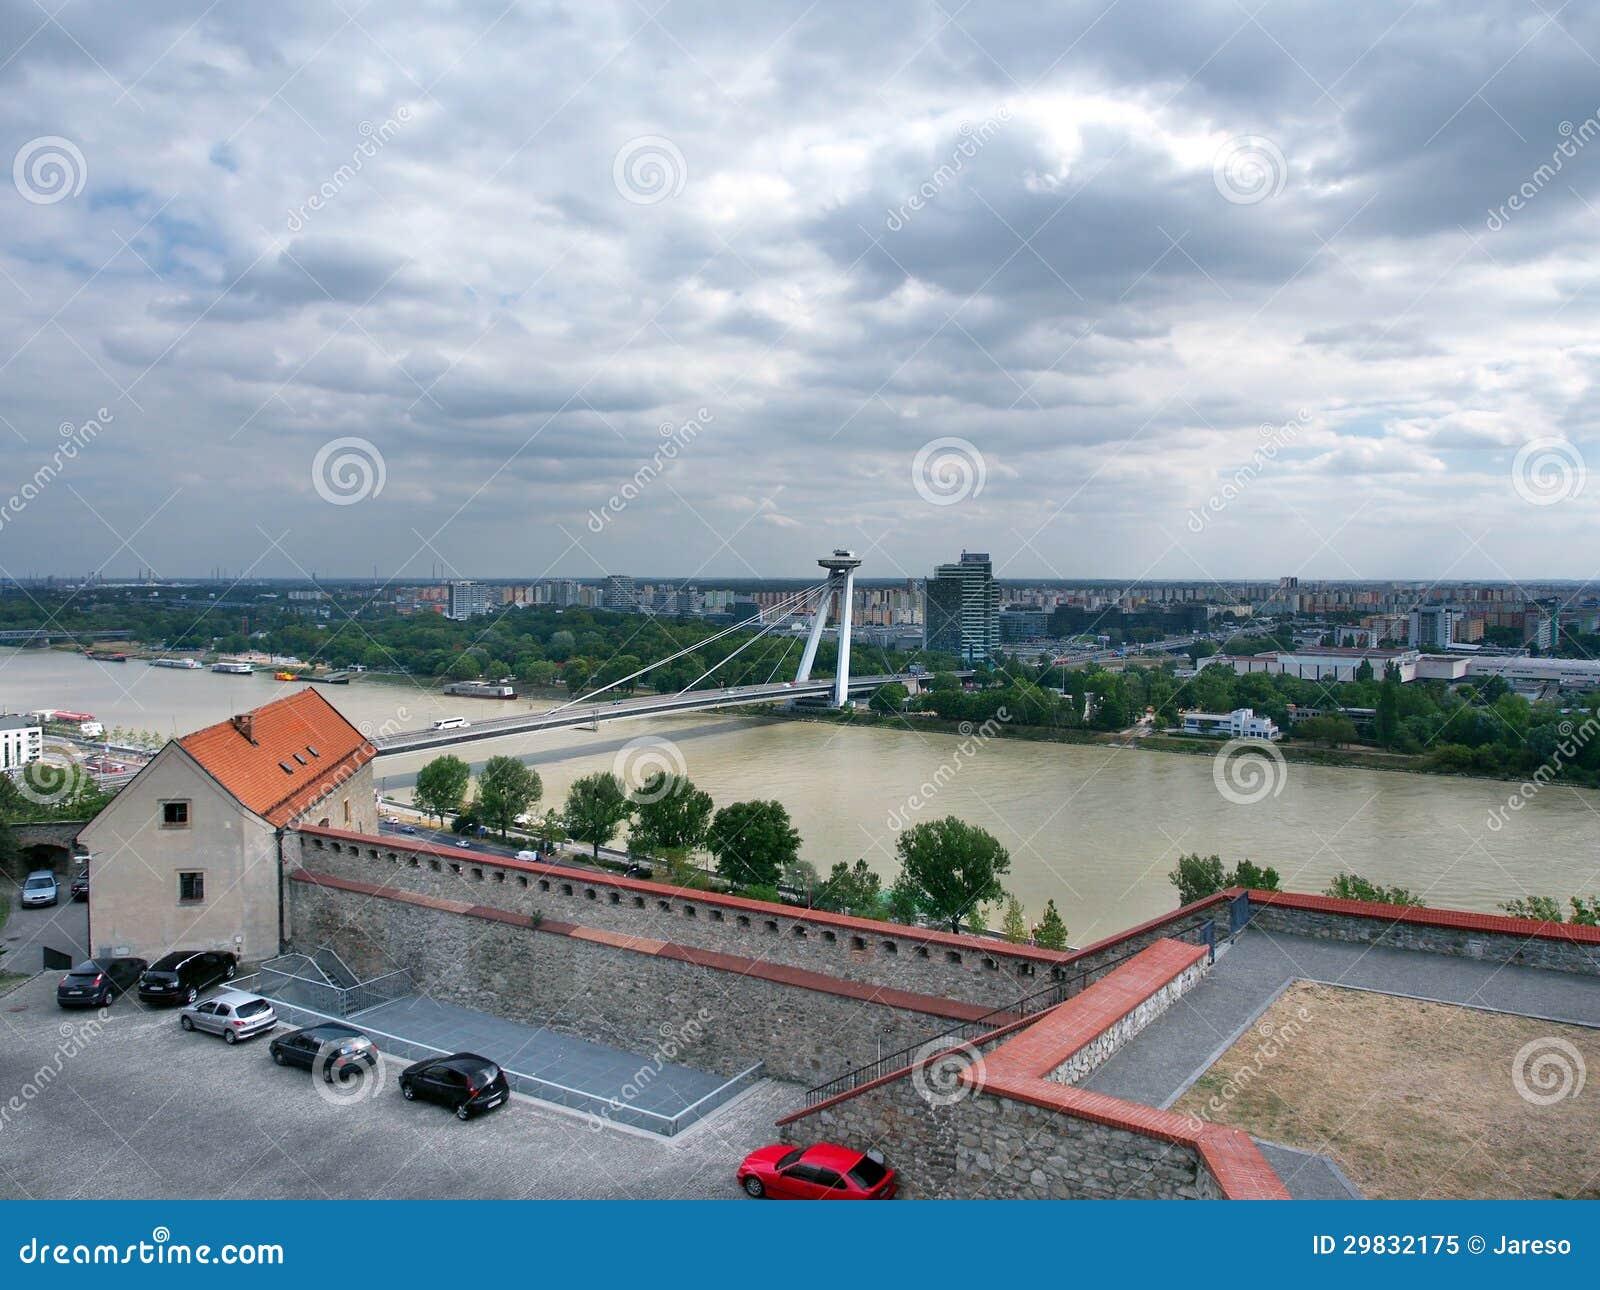 Stormy weather over Bratislava